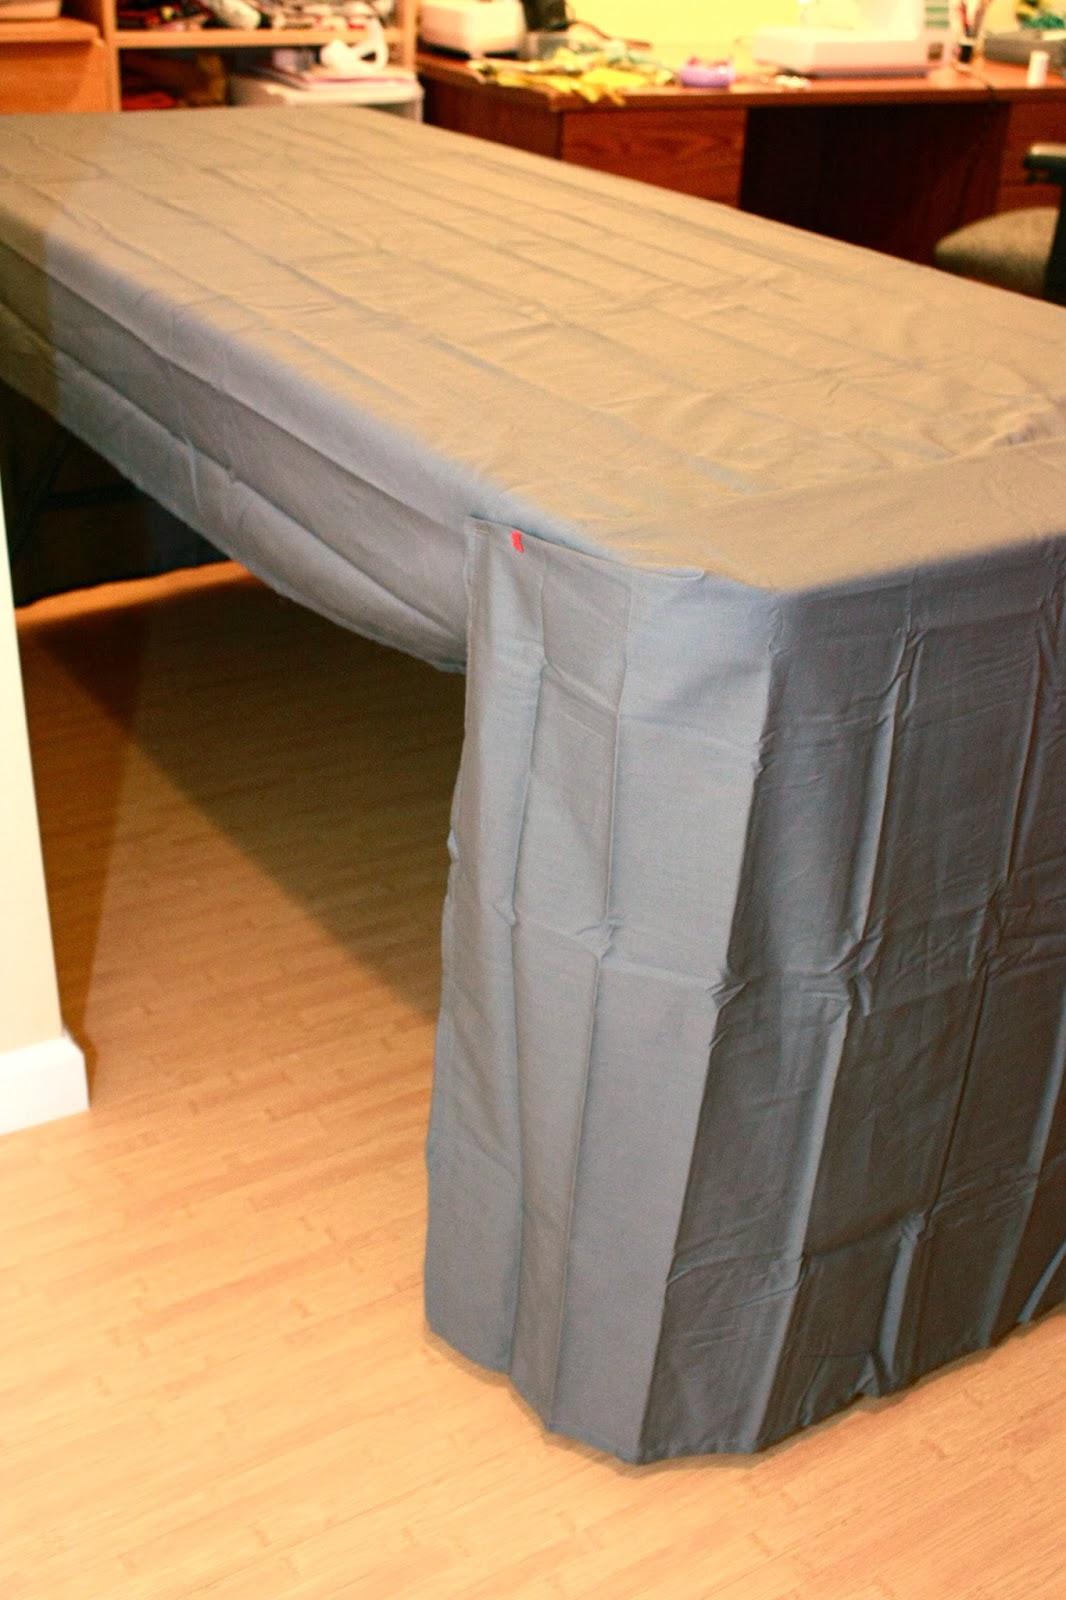 Black Bed Sheet Fitting